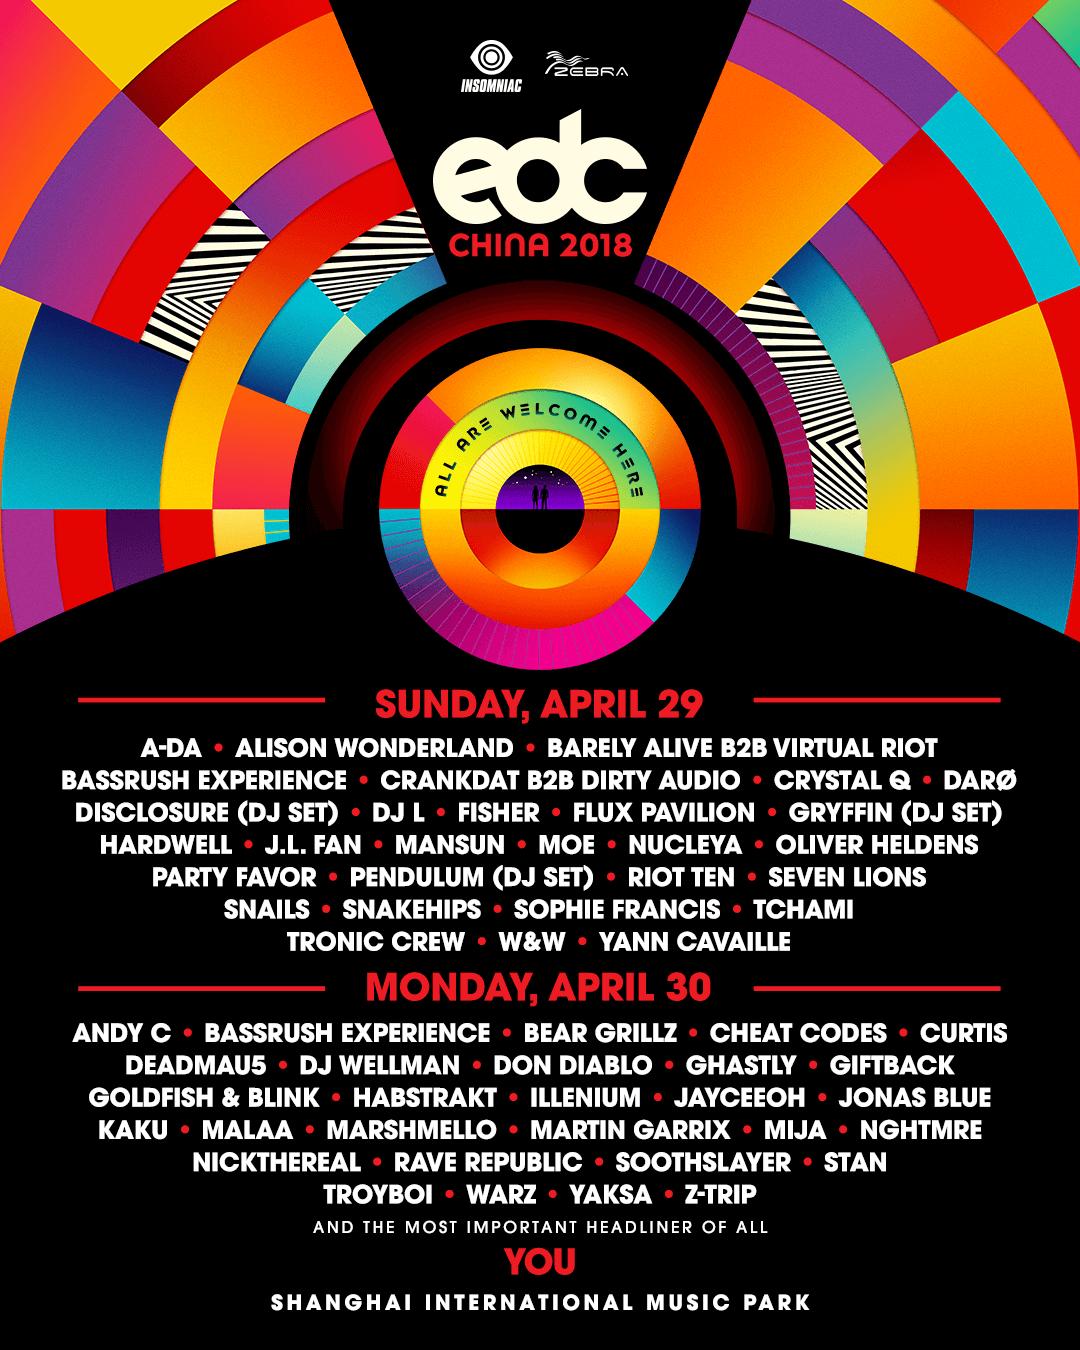 EDC China 2018 lineup